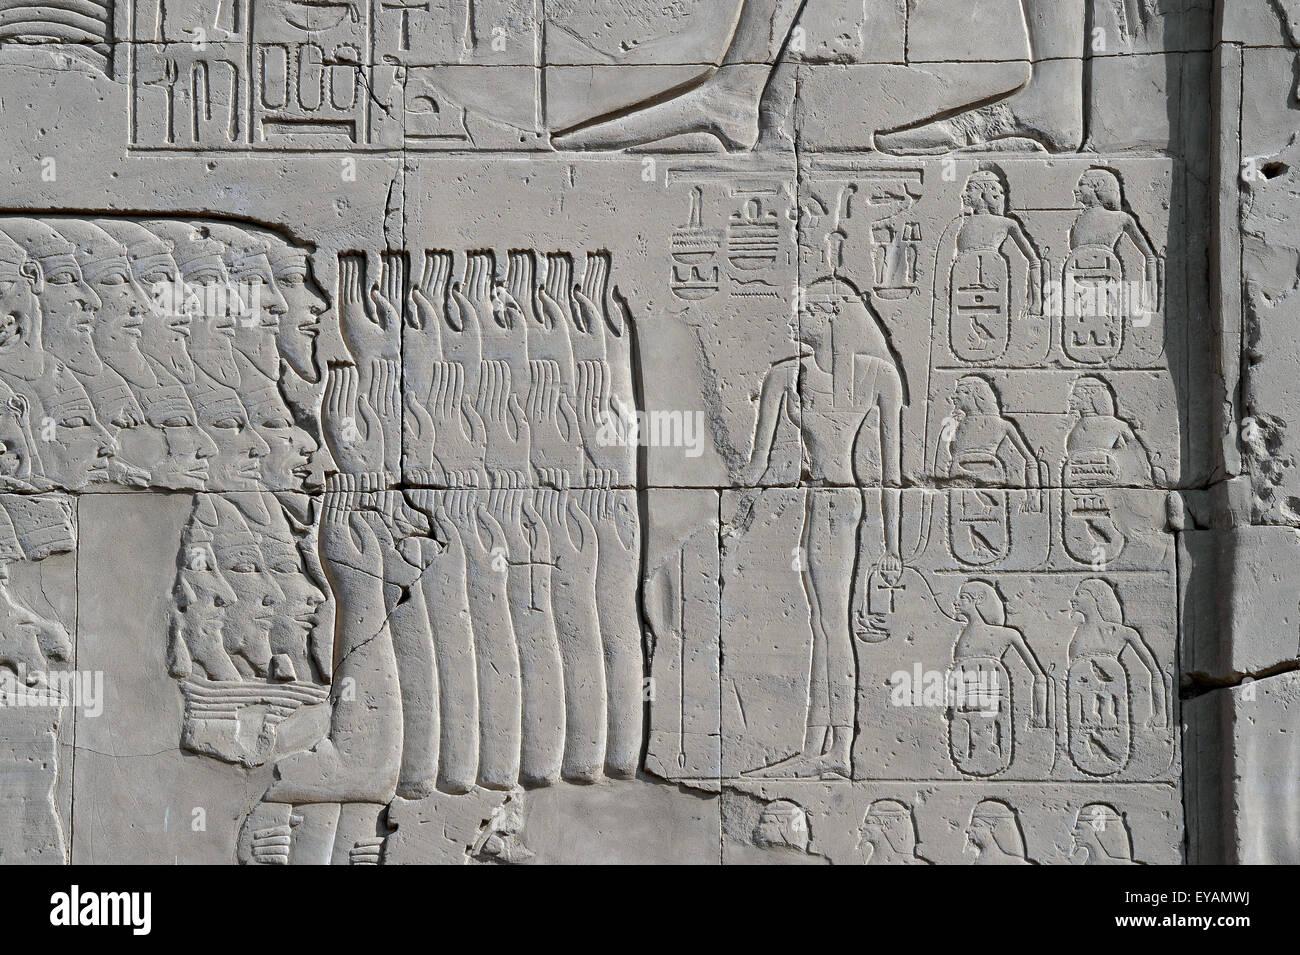 Karnak, Luxor, Egypt. Temple of Karnak sacred to god Amon: the won enemies by Tuthmosis III - Stock Image